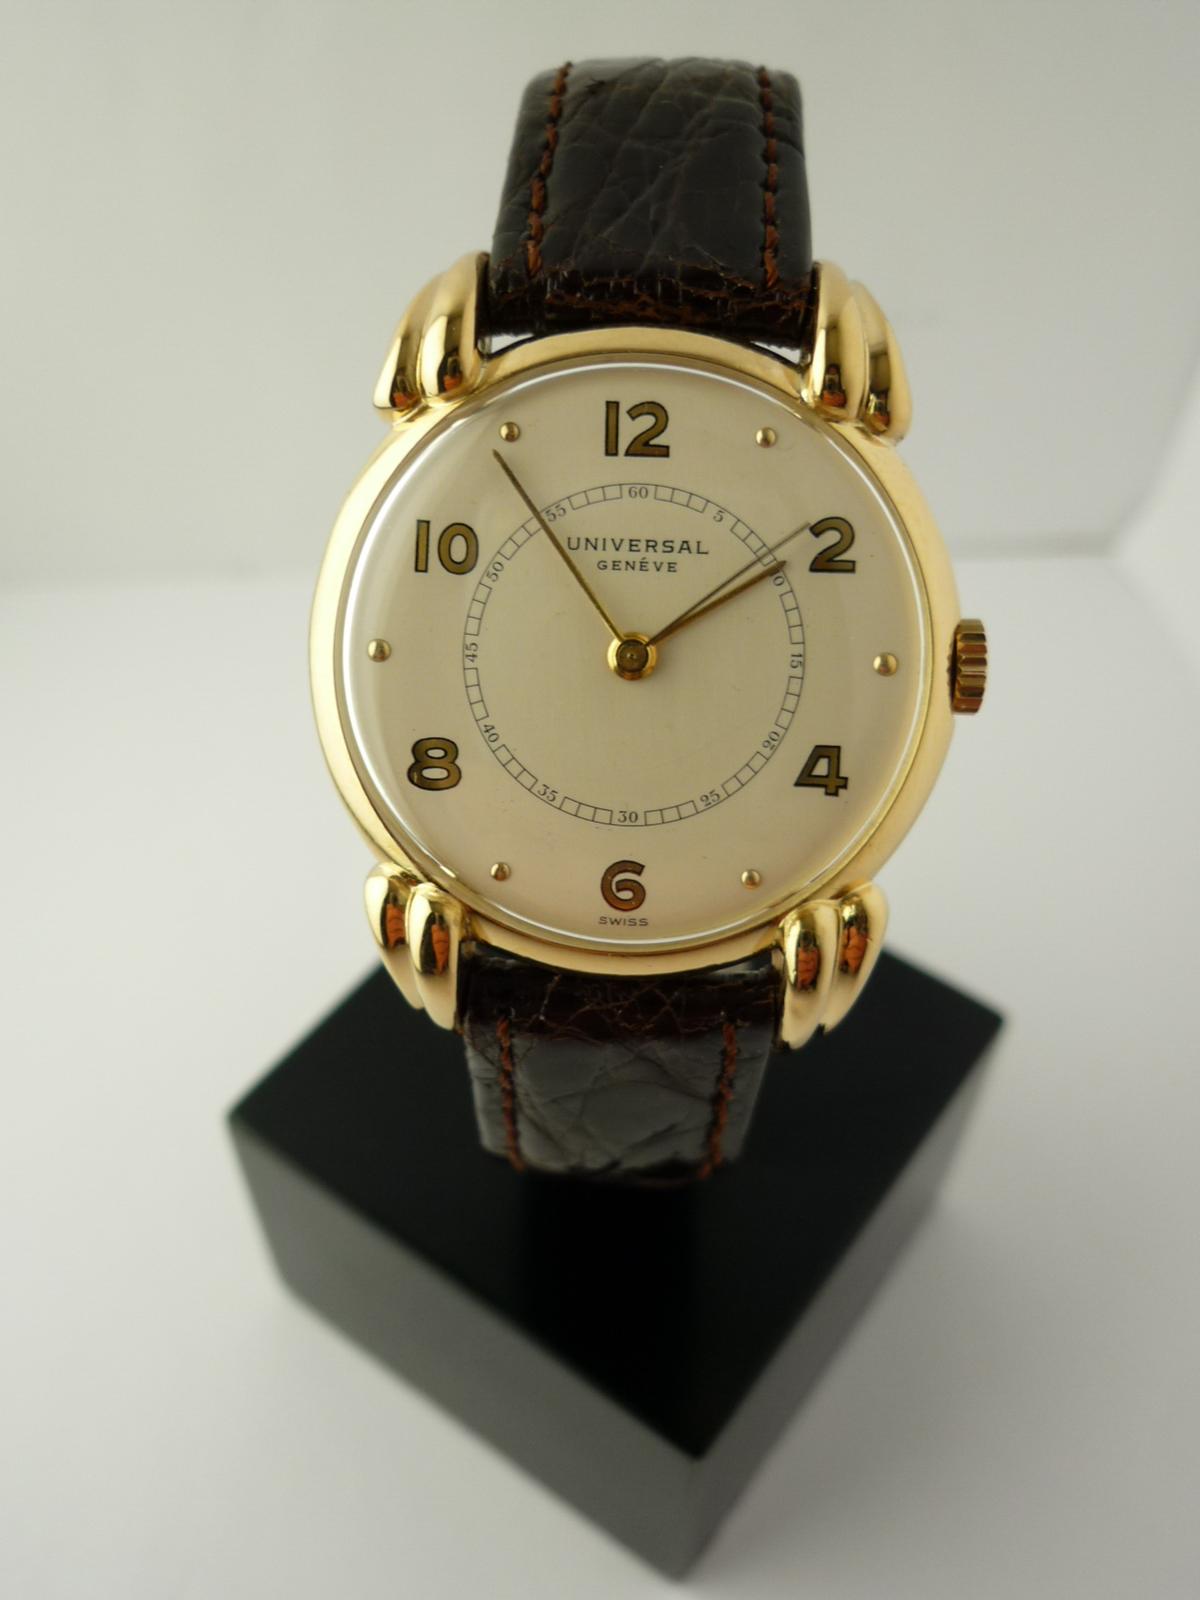 Universal Geneve 18k gold wristwatch (1945)